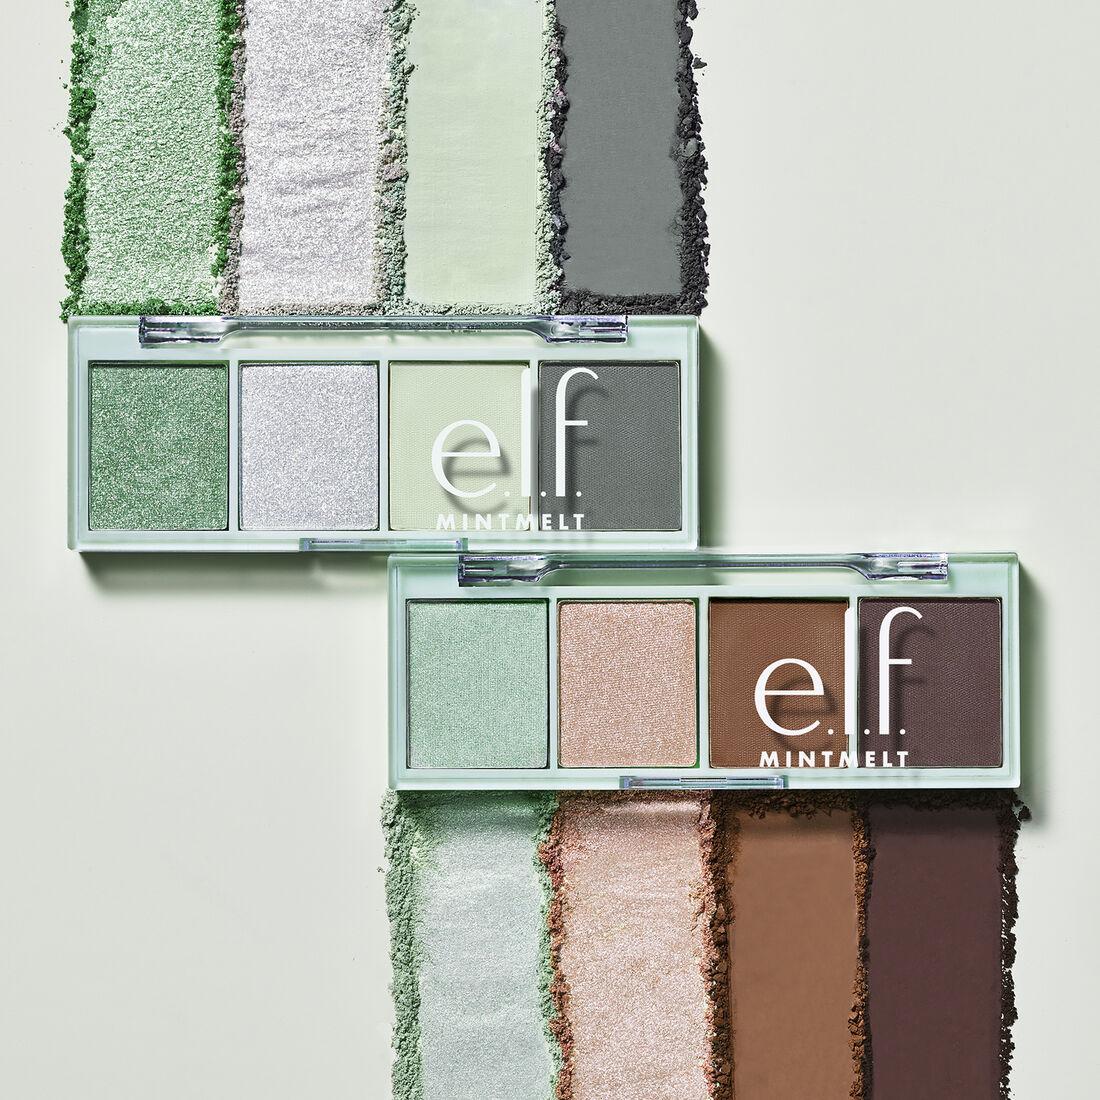 ELF Mint Melt Collection